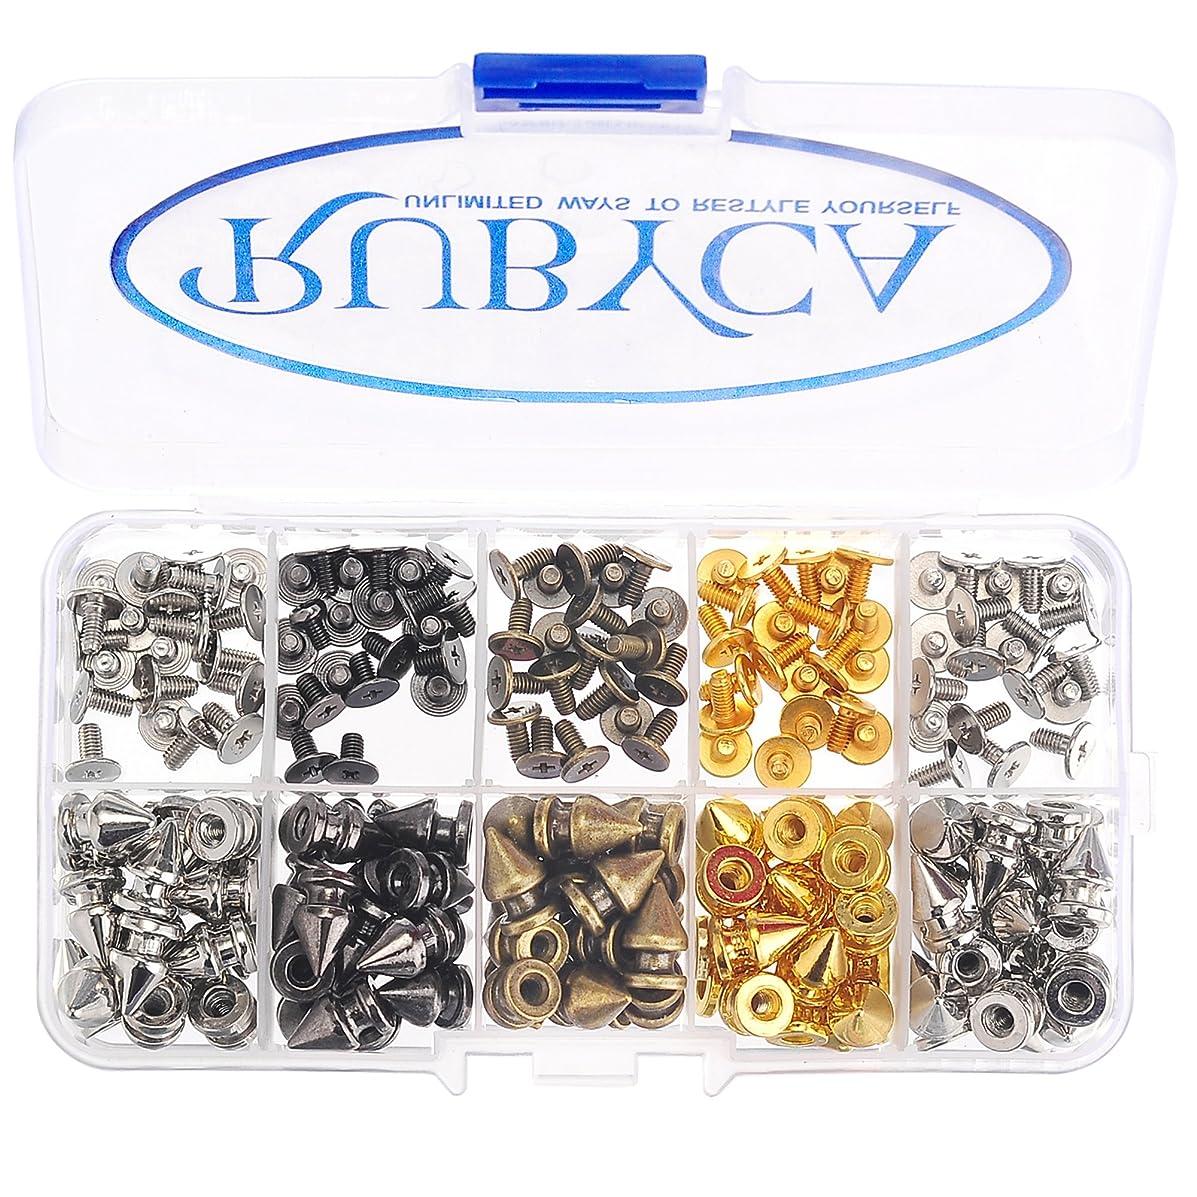 RUBYCA 12MM 100 Sets Metal Tree Spikes and Studs Metallic Screw-Back DIY Kit Leathercraft Mix Colors